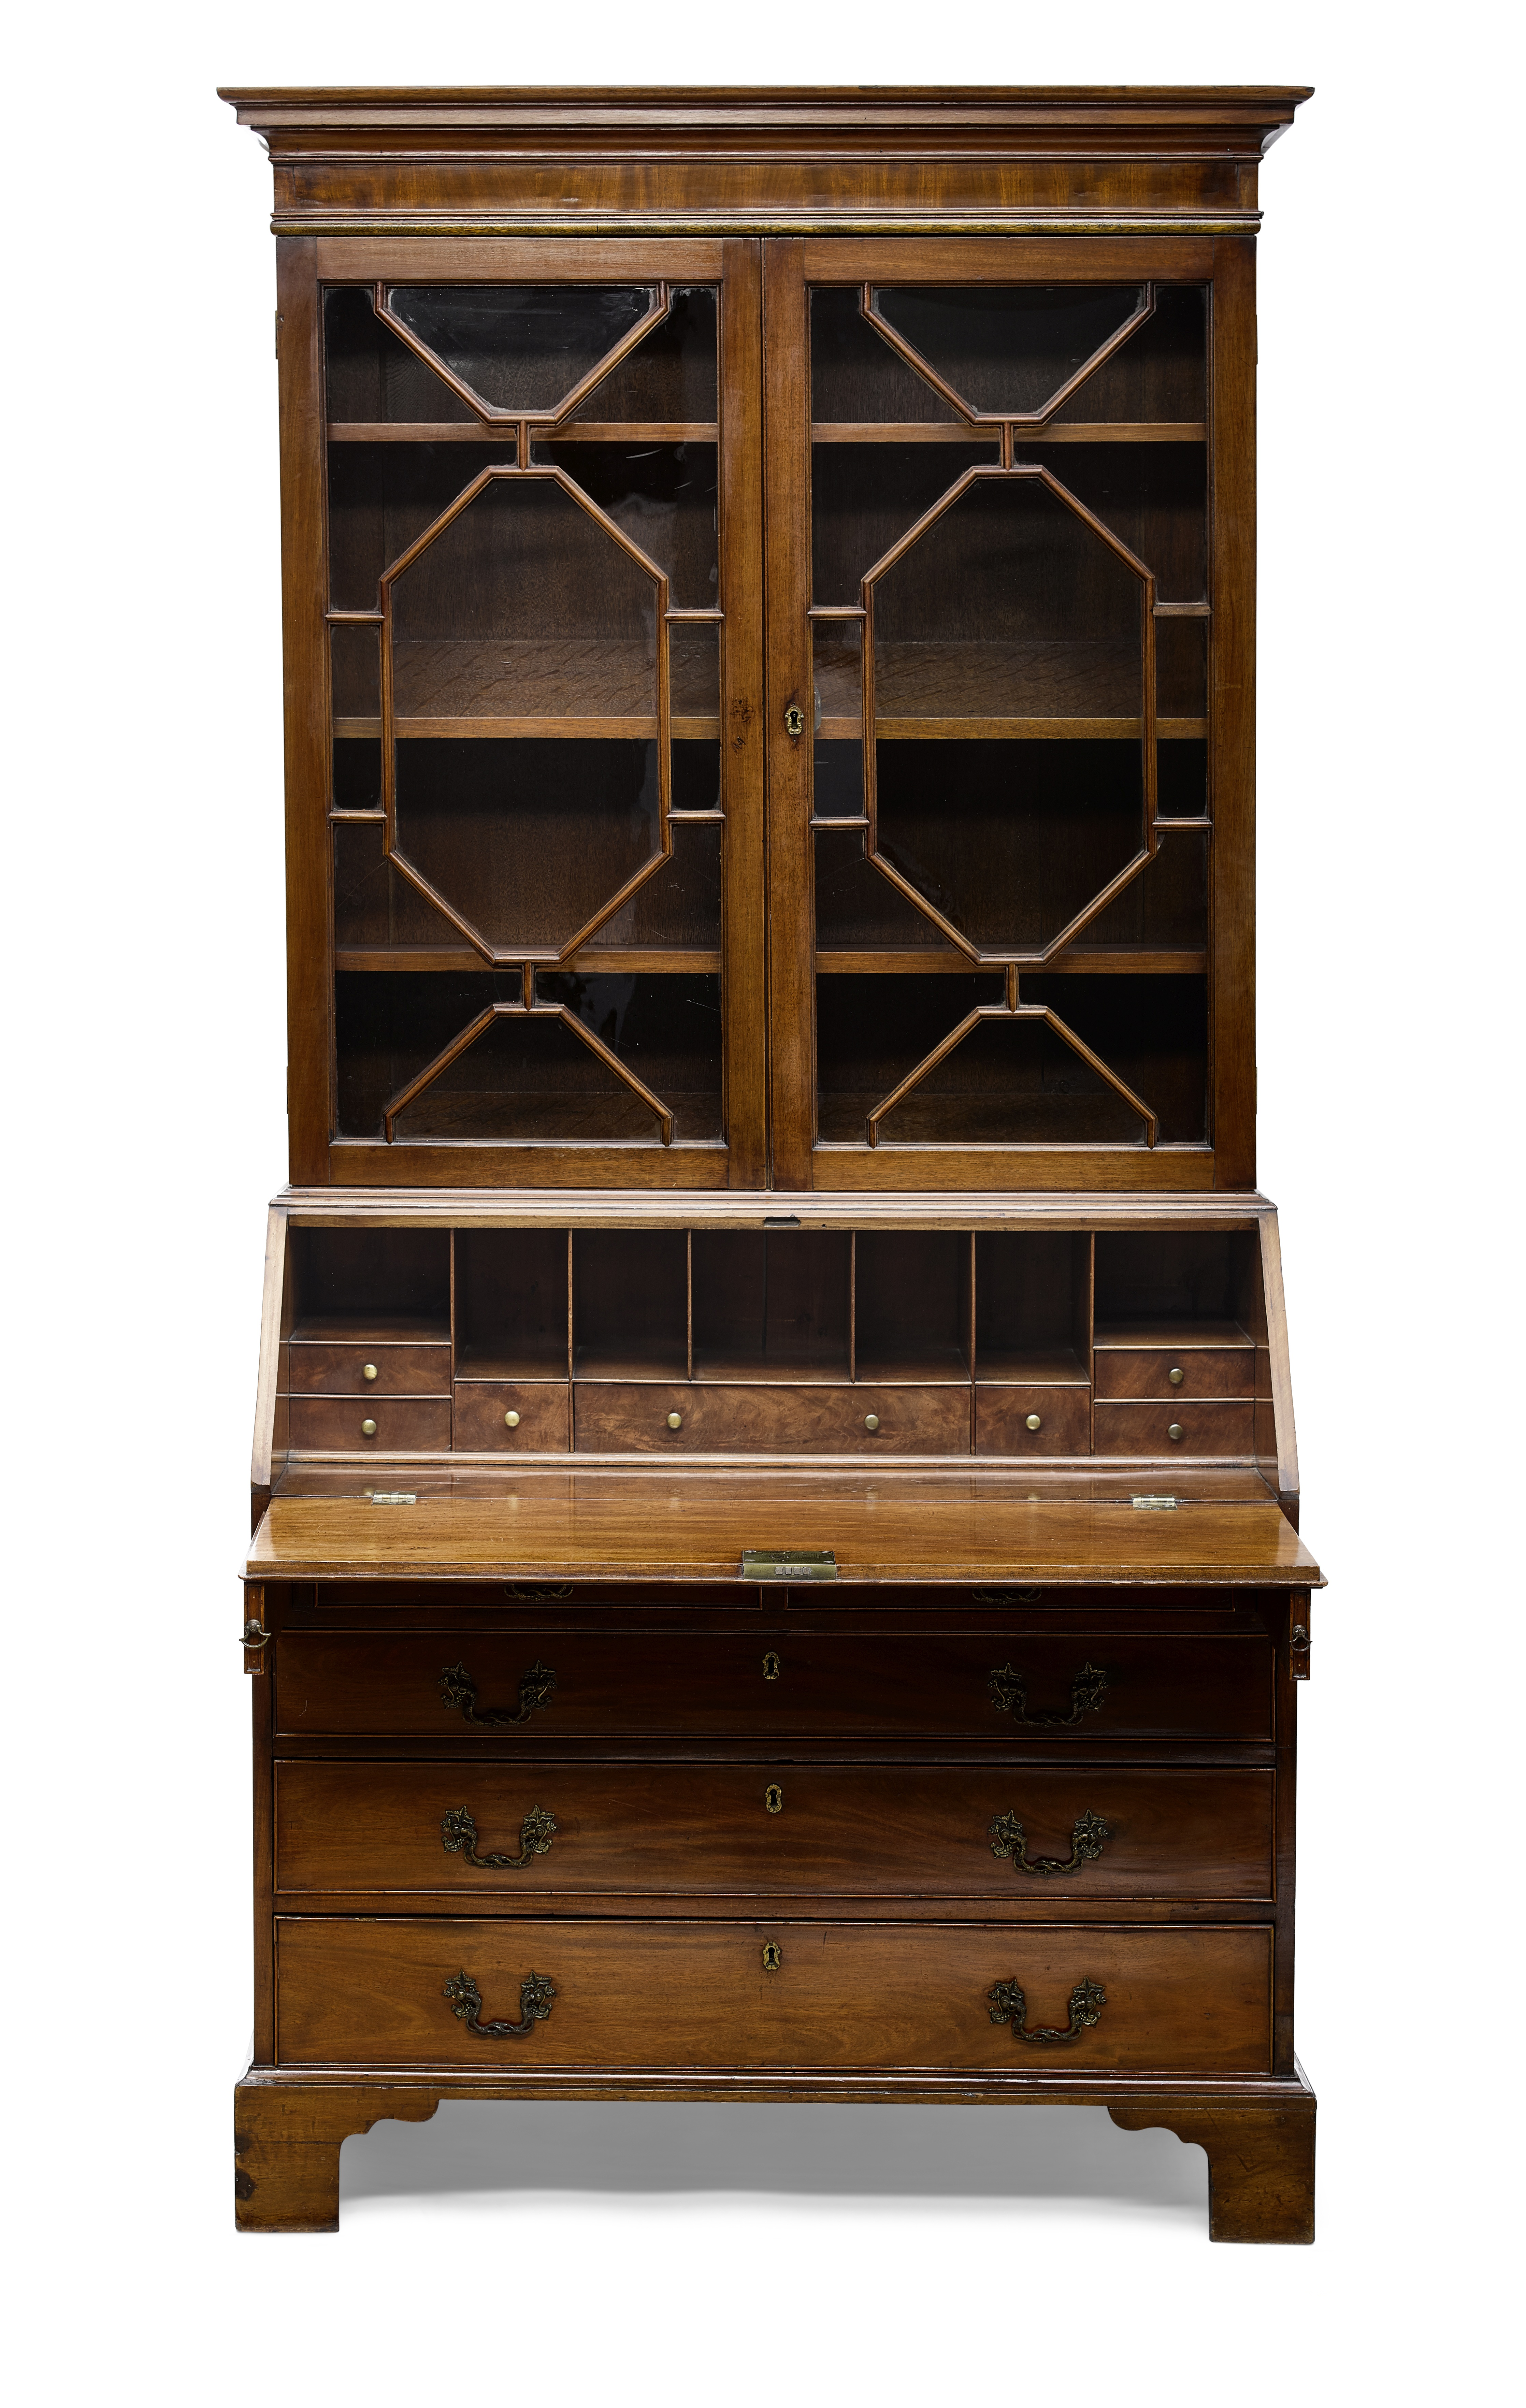 Lot 141 - A George III Mahogany Secretary Bookcase Late 18th century